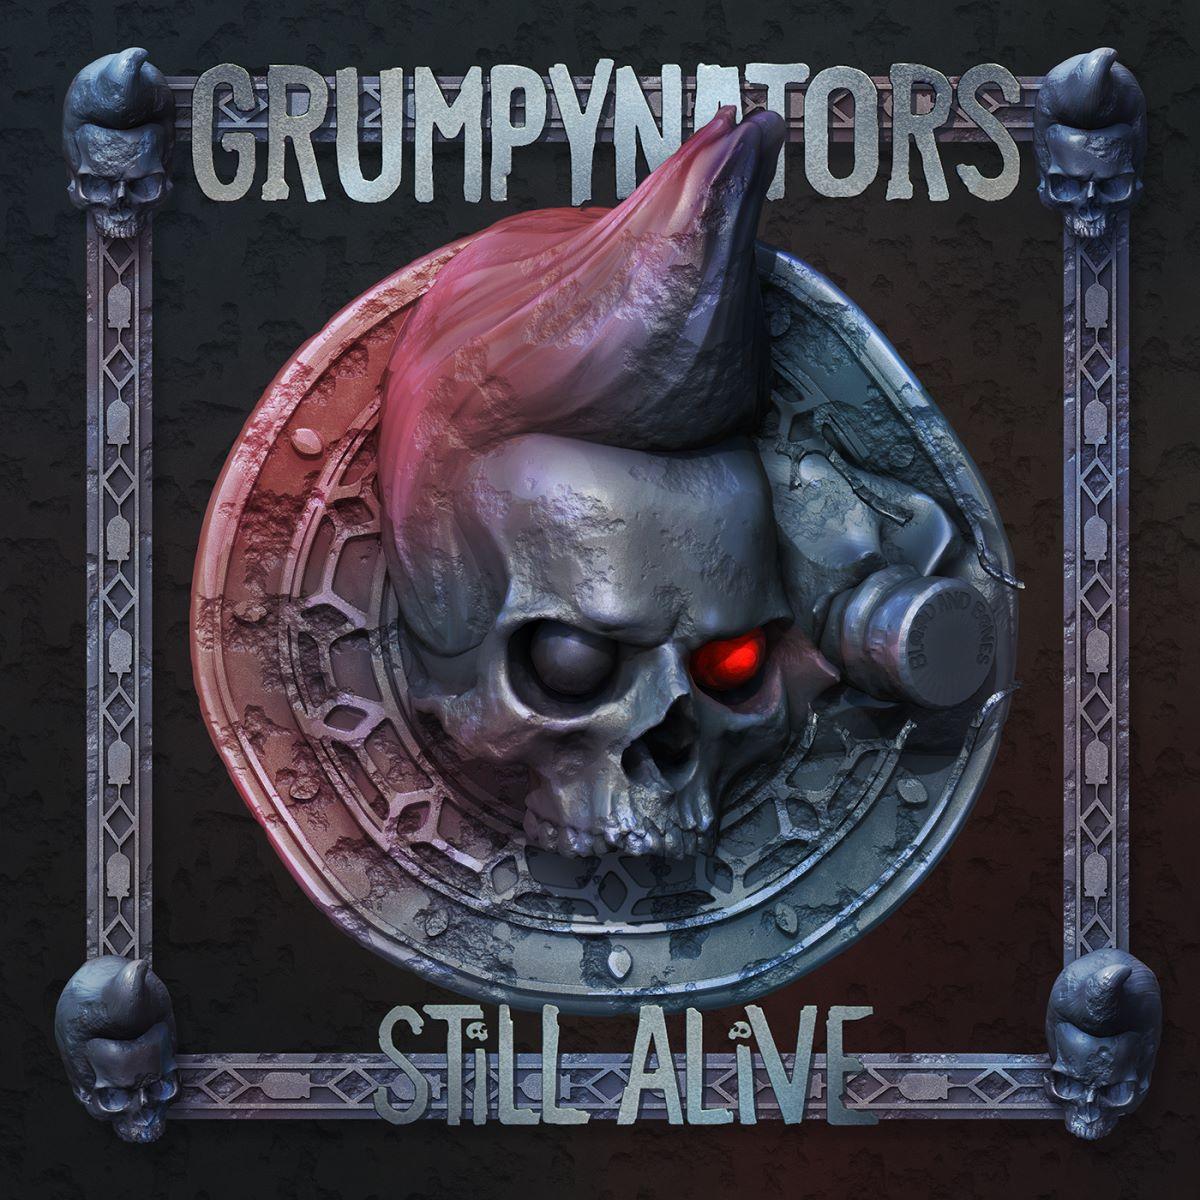 grumpynators - still alive - album cover